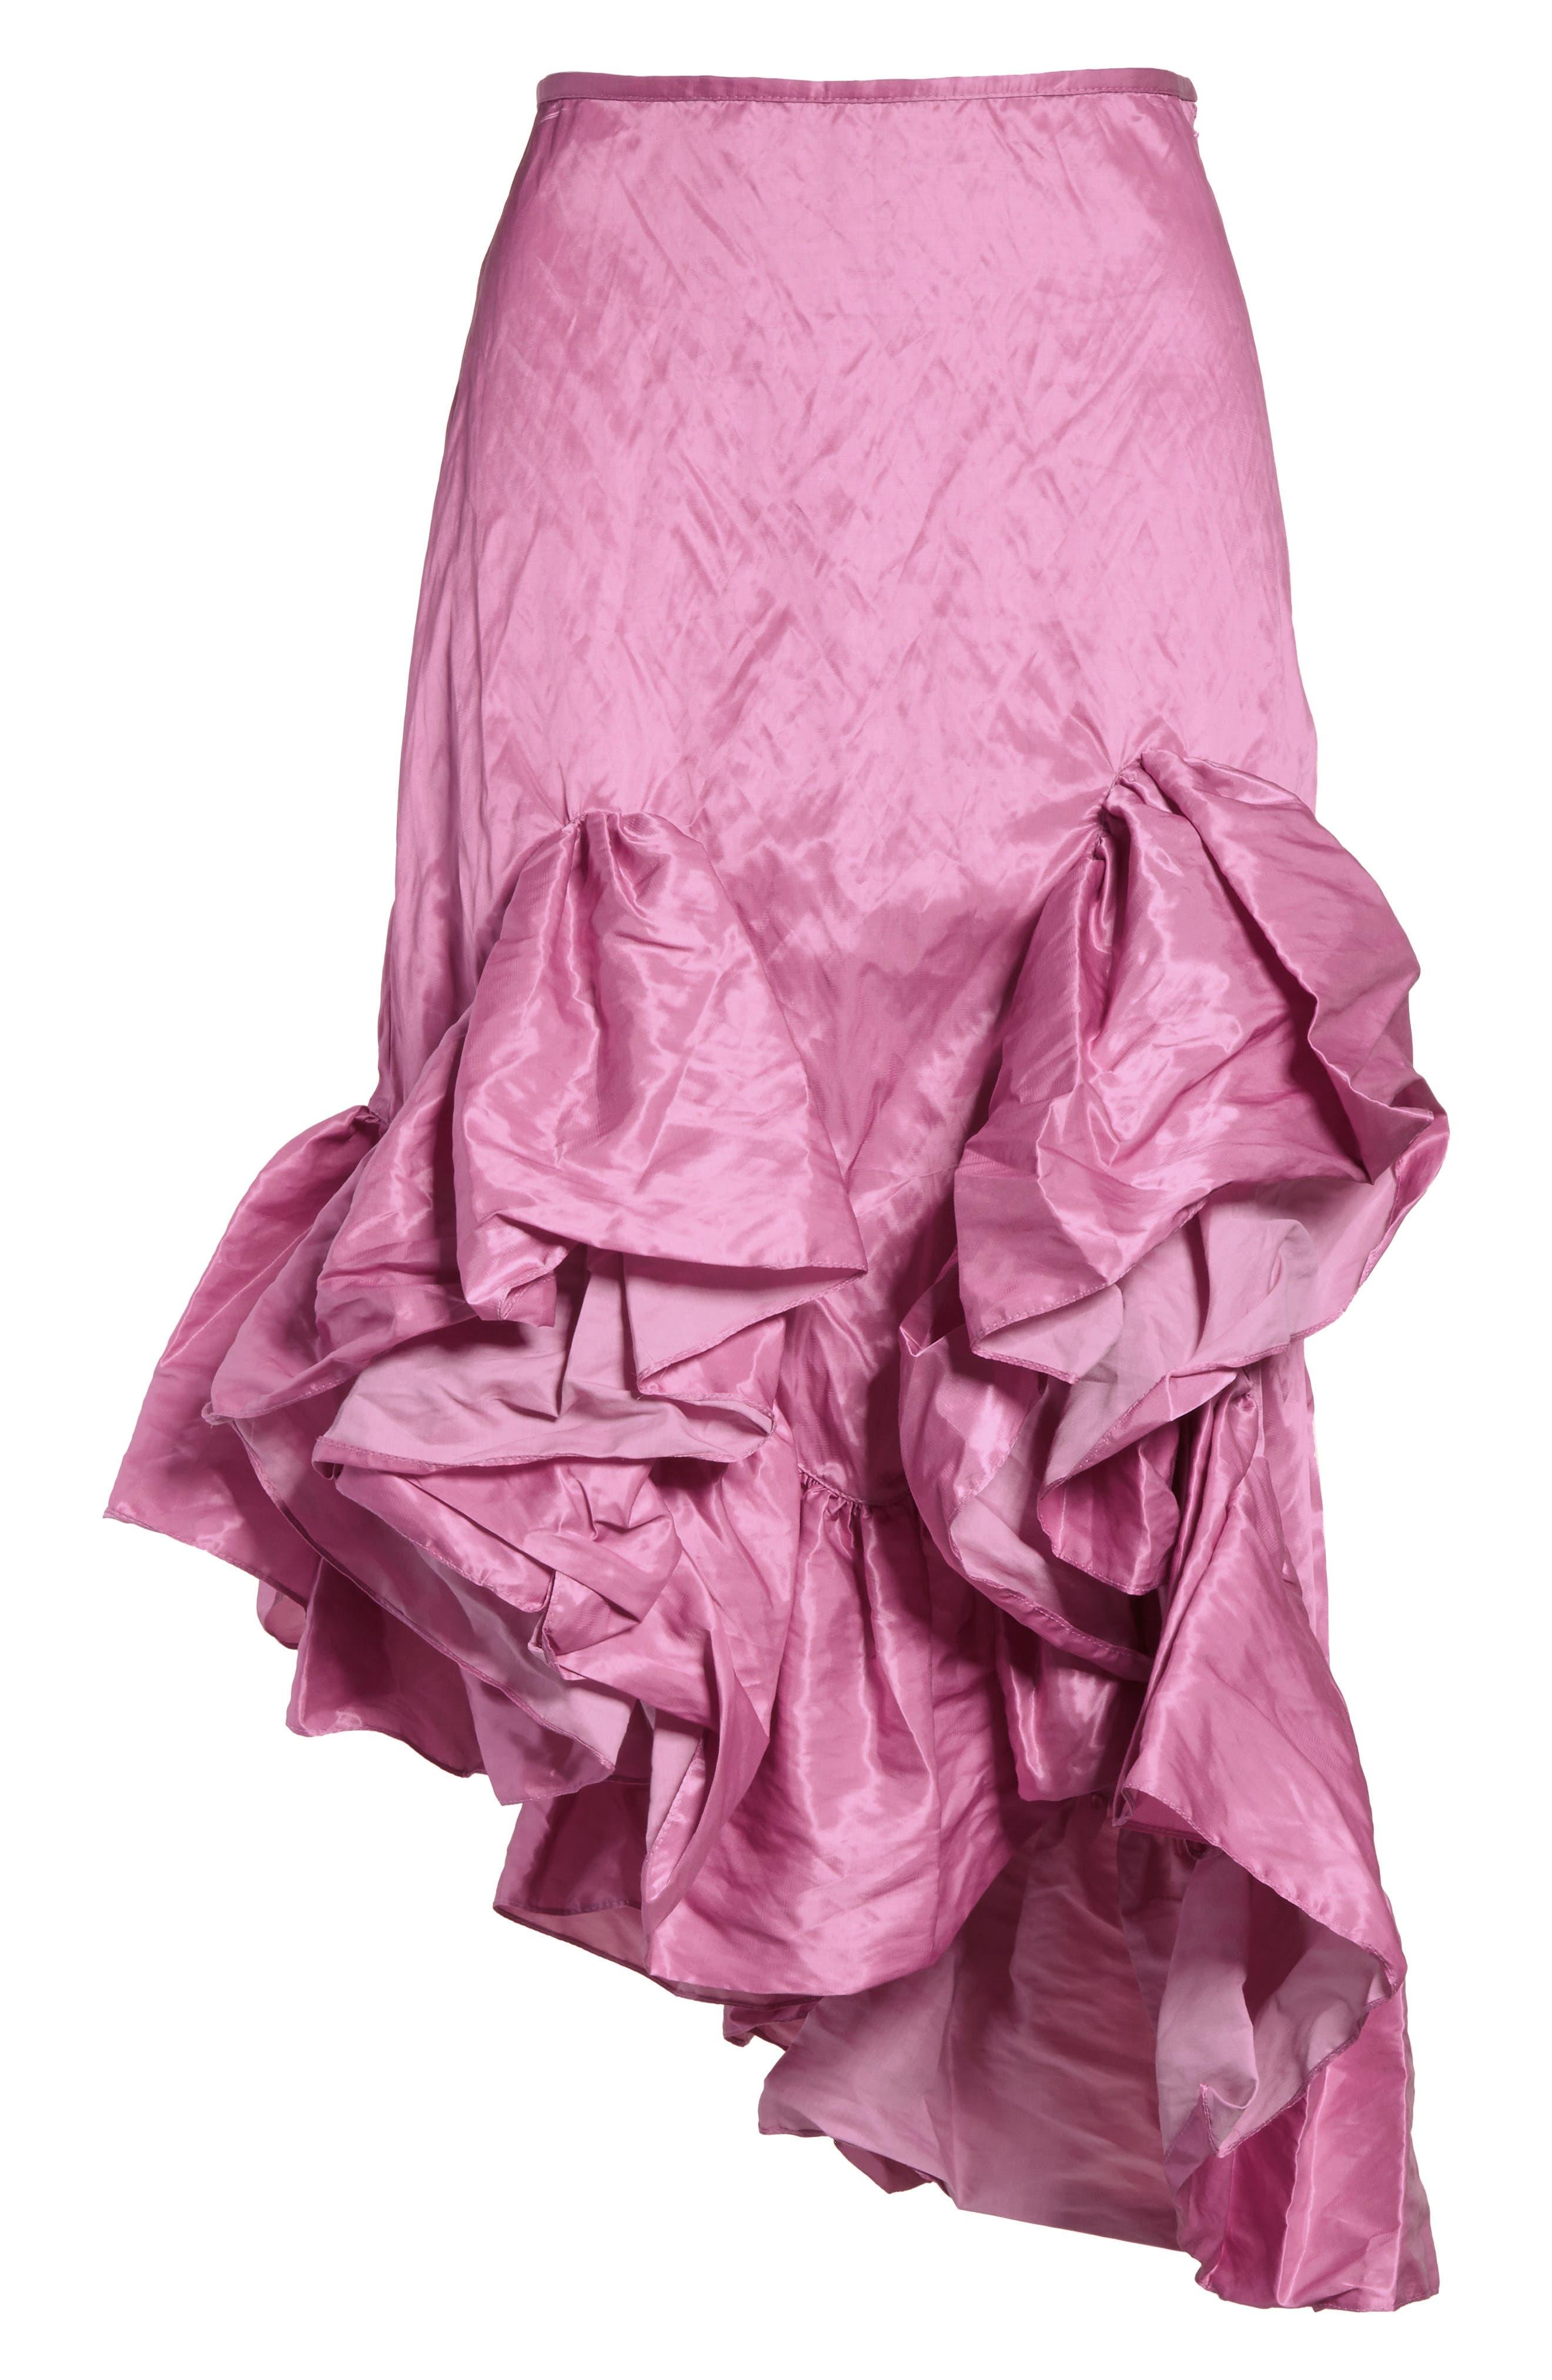 Marques'Almeida Asymmetrical Ruffle Taffeta Skirt,                             Alternate thumbnail 6, color,                             650